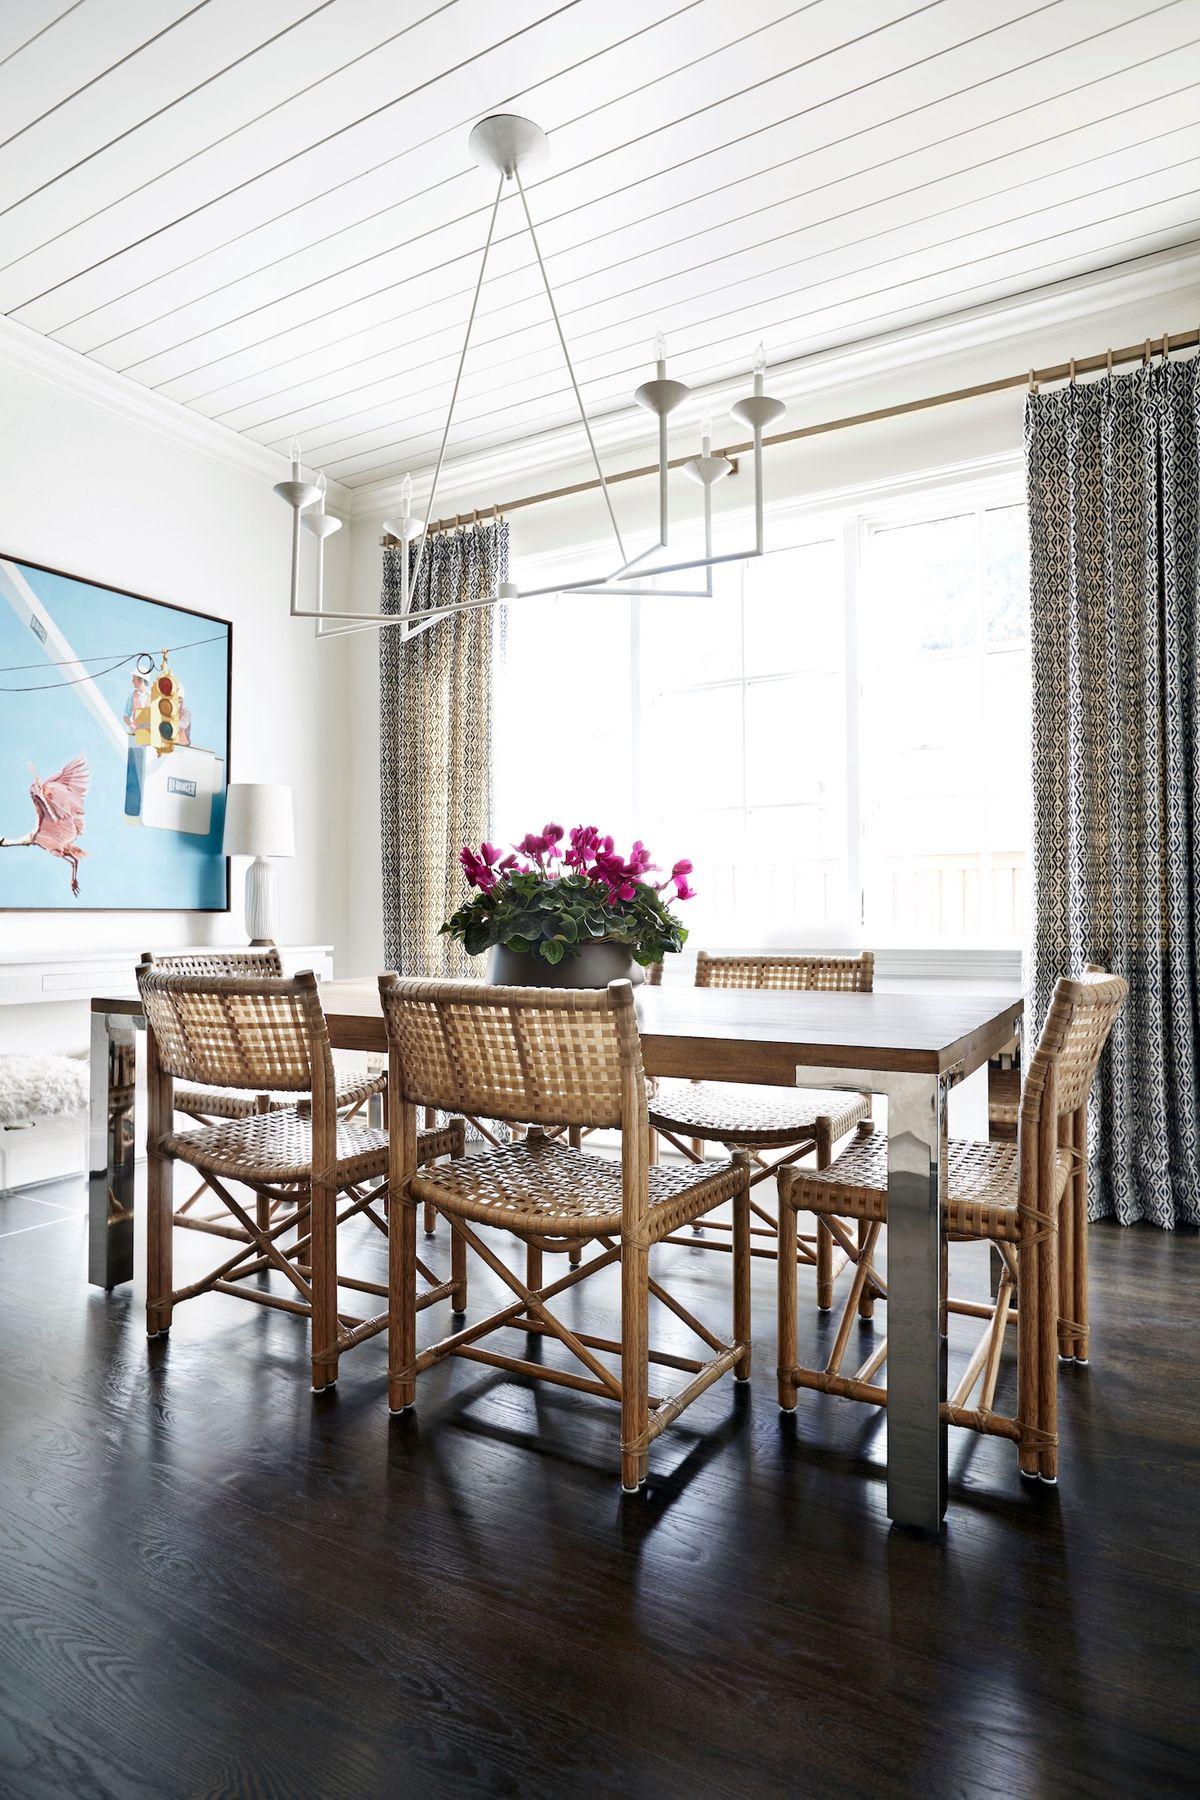 Pär Bengtsson Home Interior Editorial Photography4.jpeg